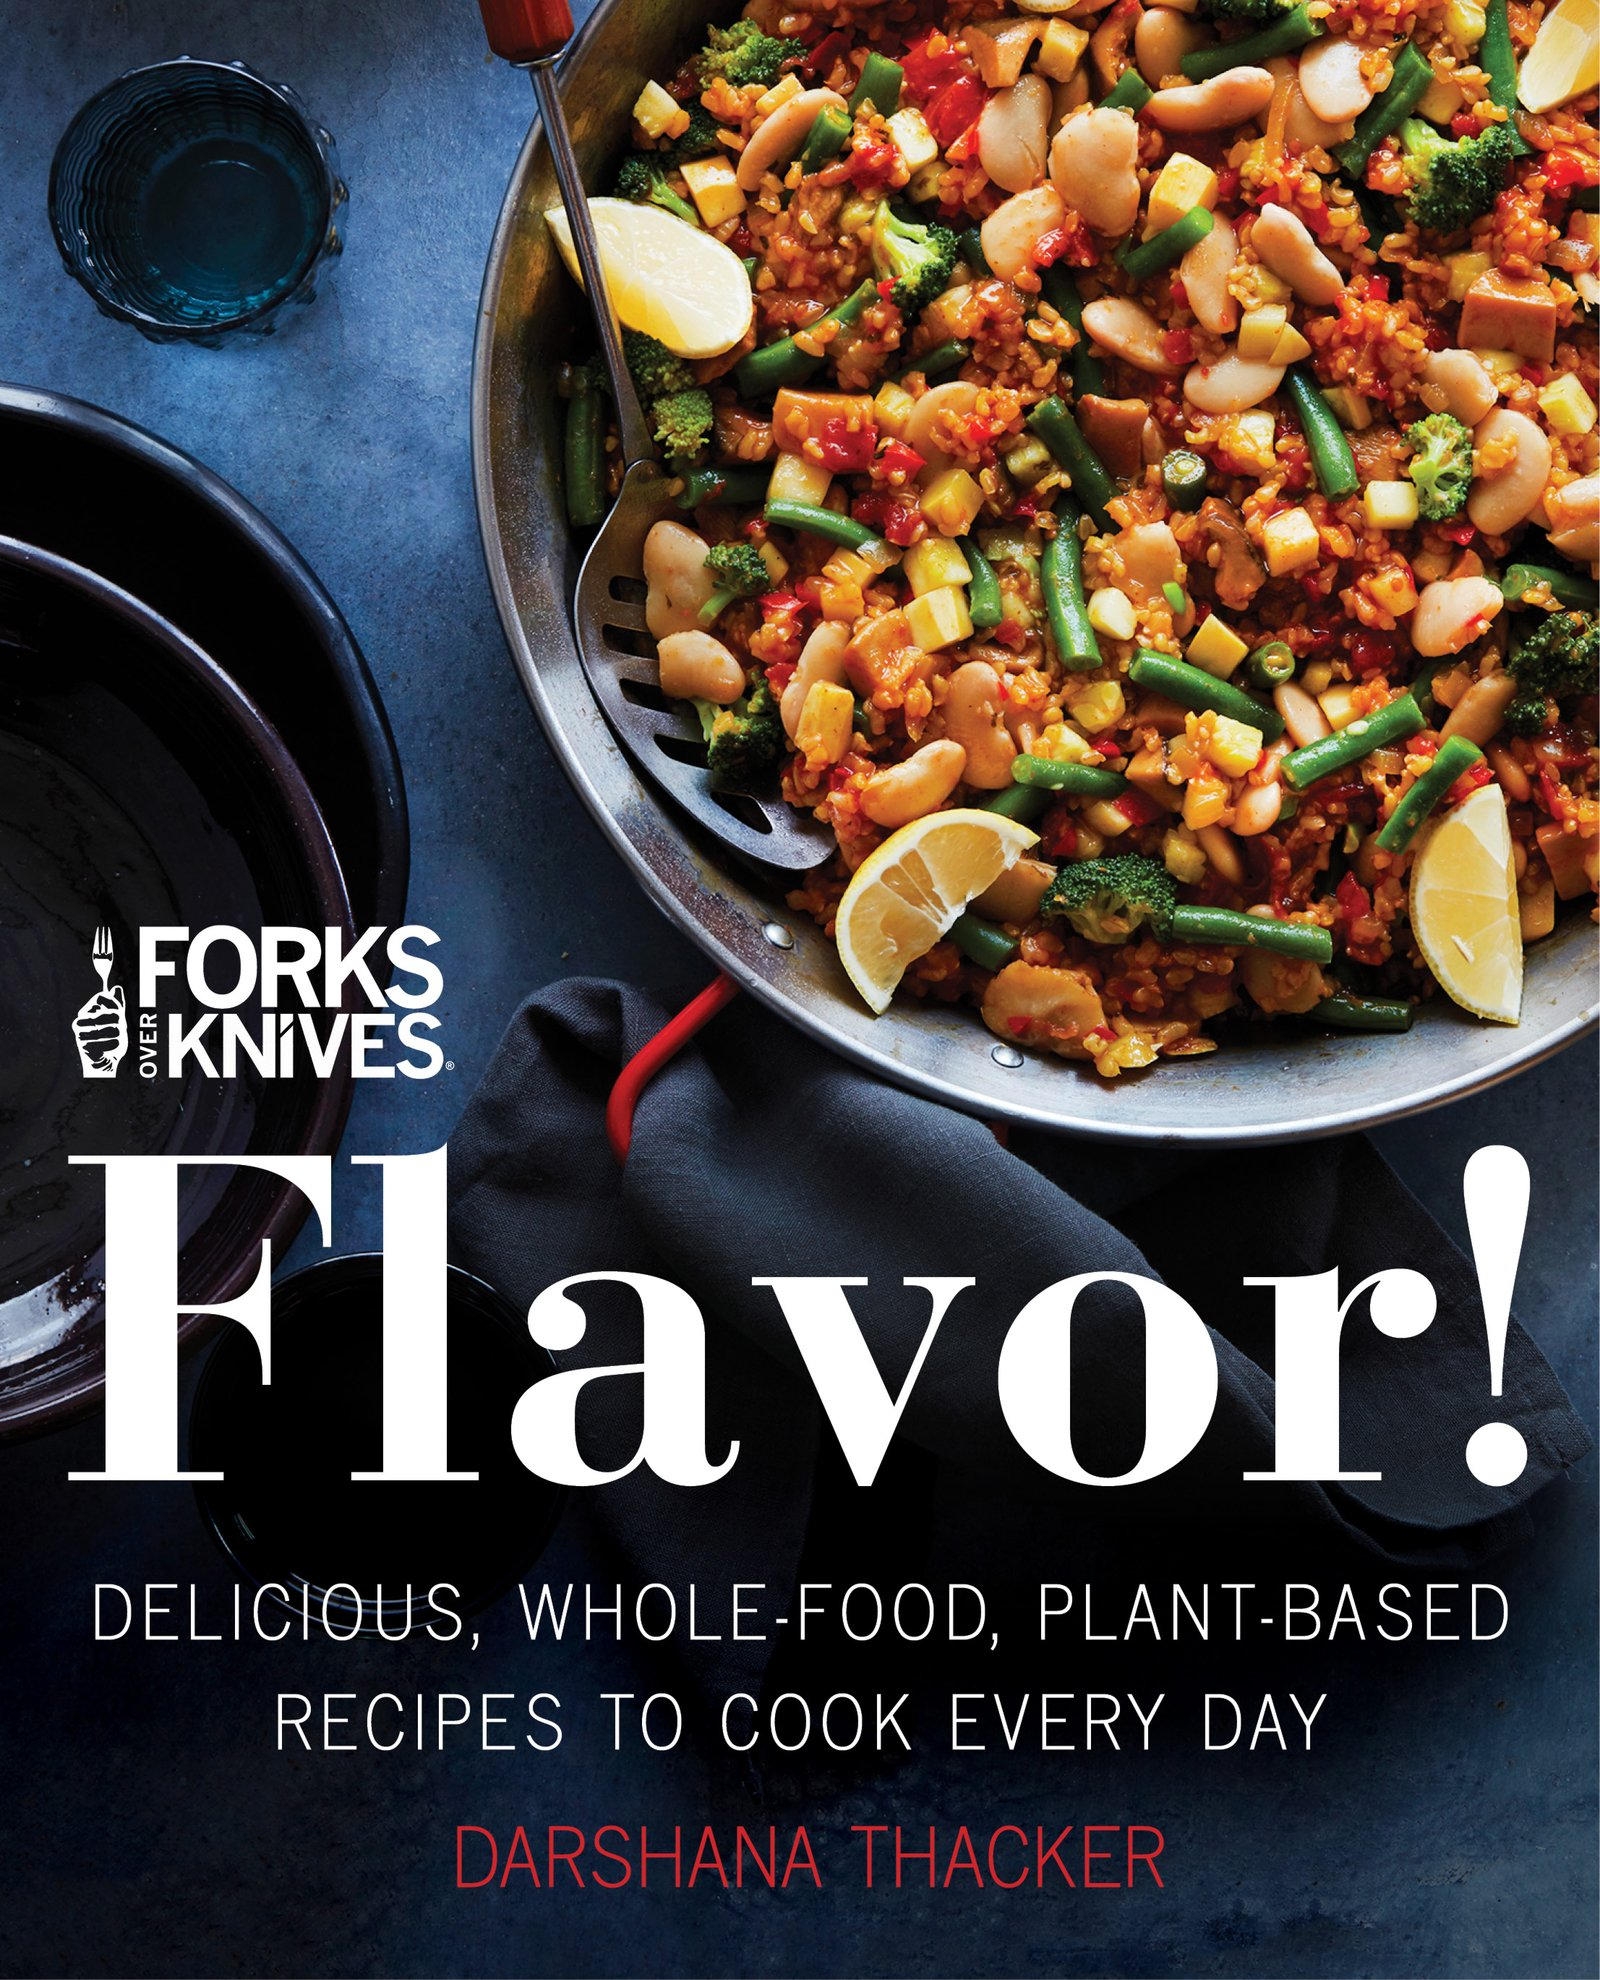 Forks Over Knives: Flavor  by Darshana Thacker